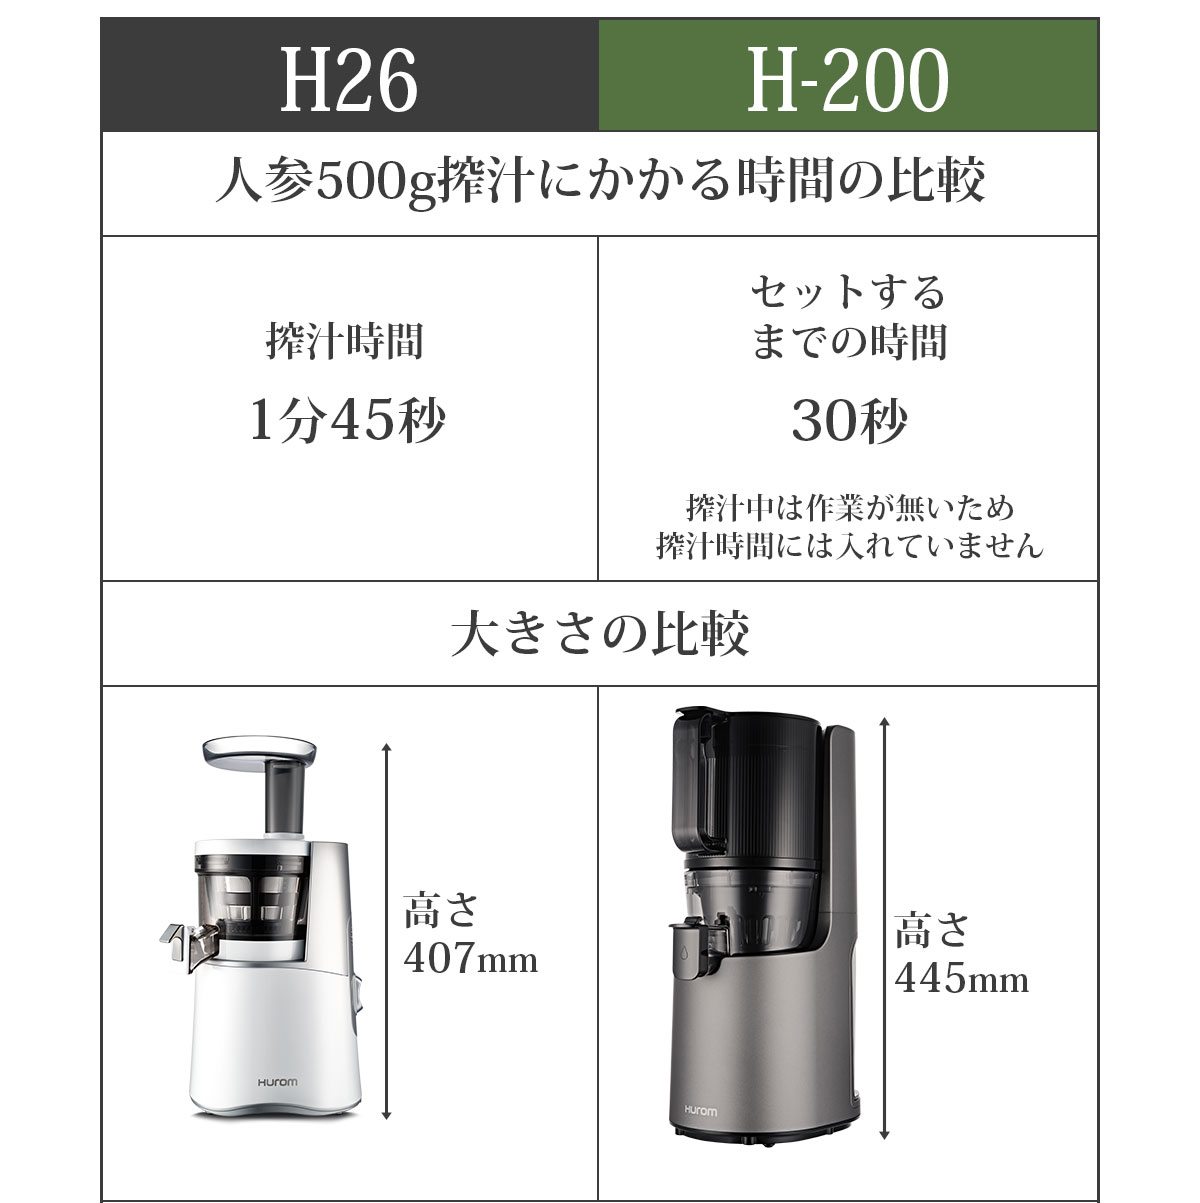 H26、H-200 人参500g搾汁にかかる時間の比較